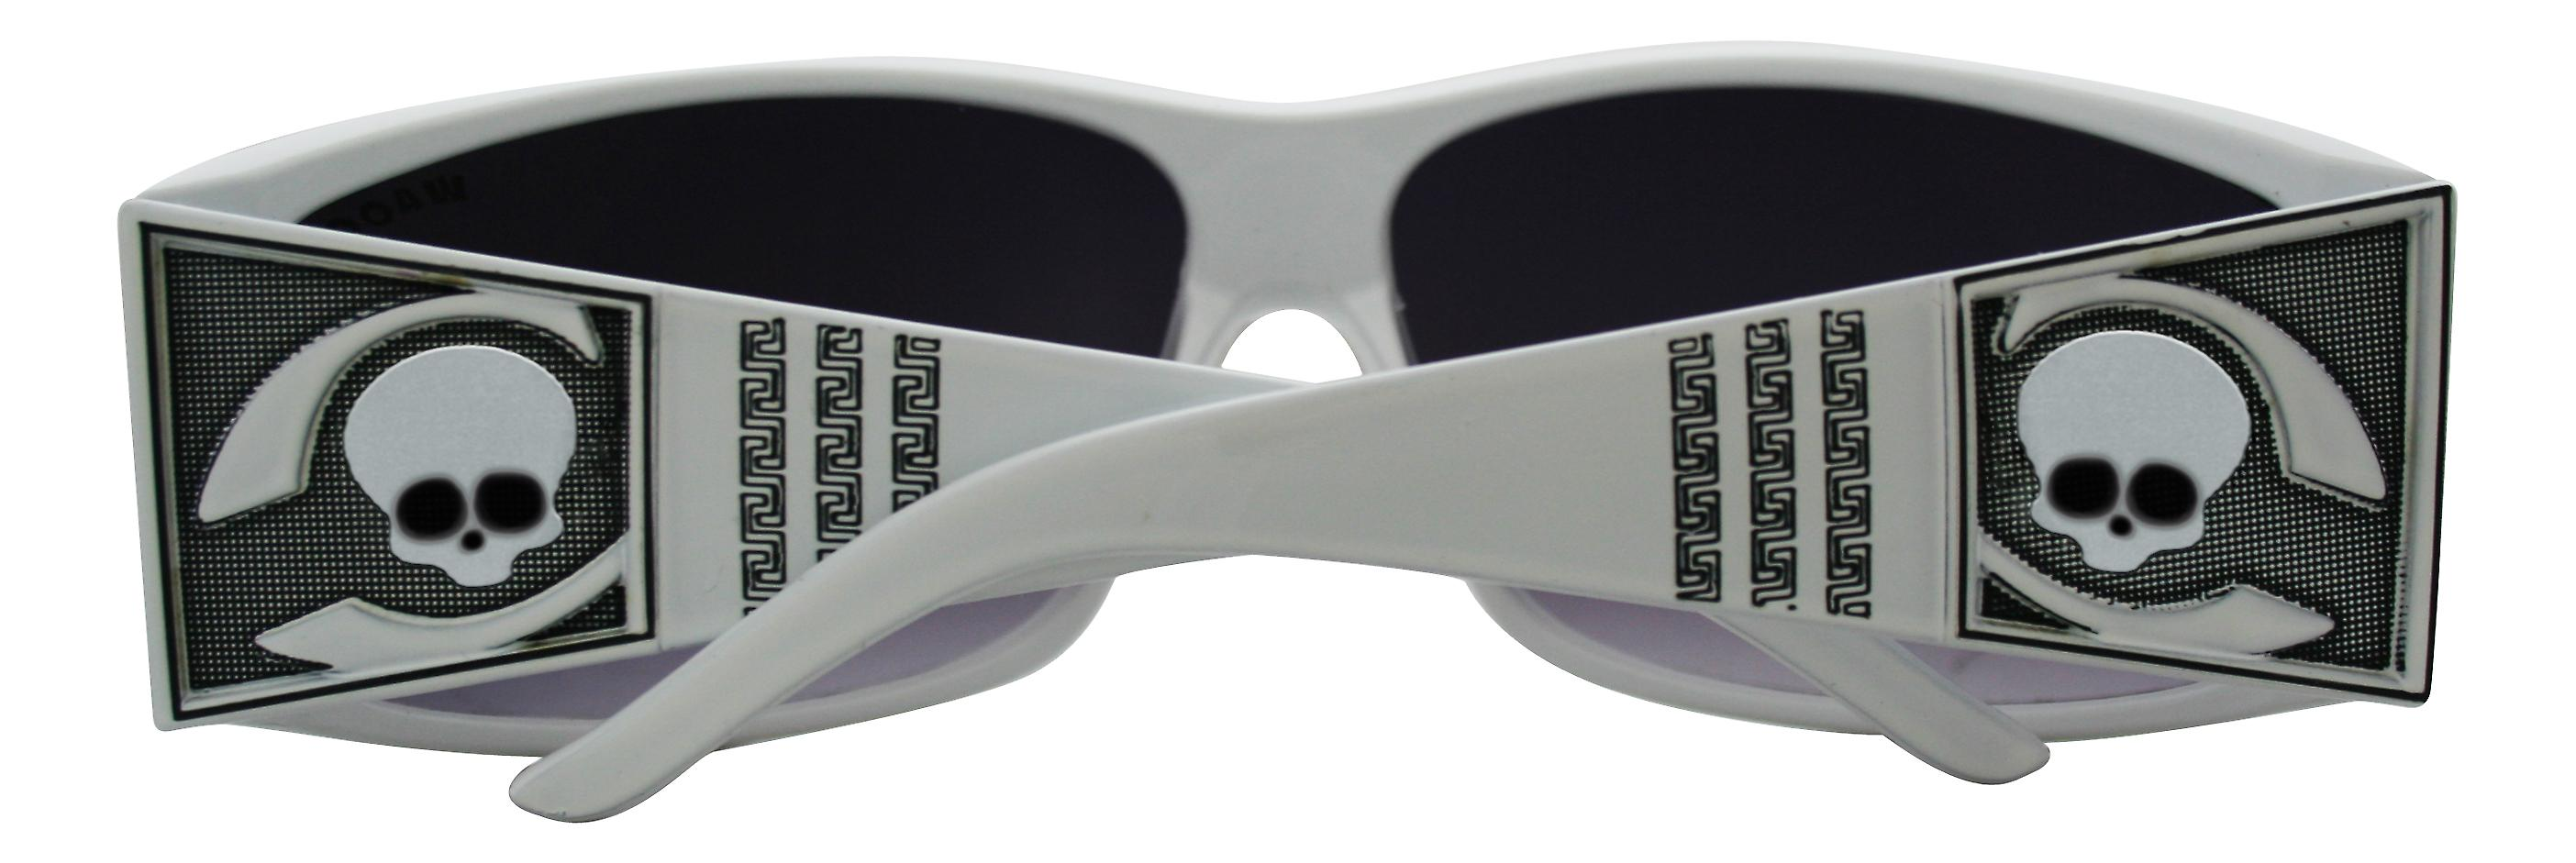 Waooh - sun glasses are TS834 - Alien Design - Protection UV400 Category 3 - Sunglasses